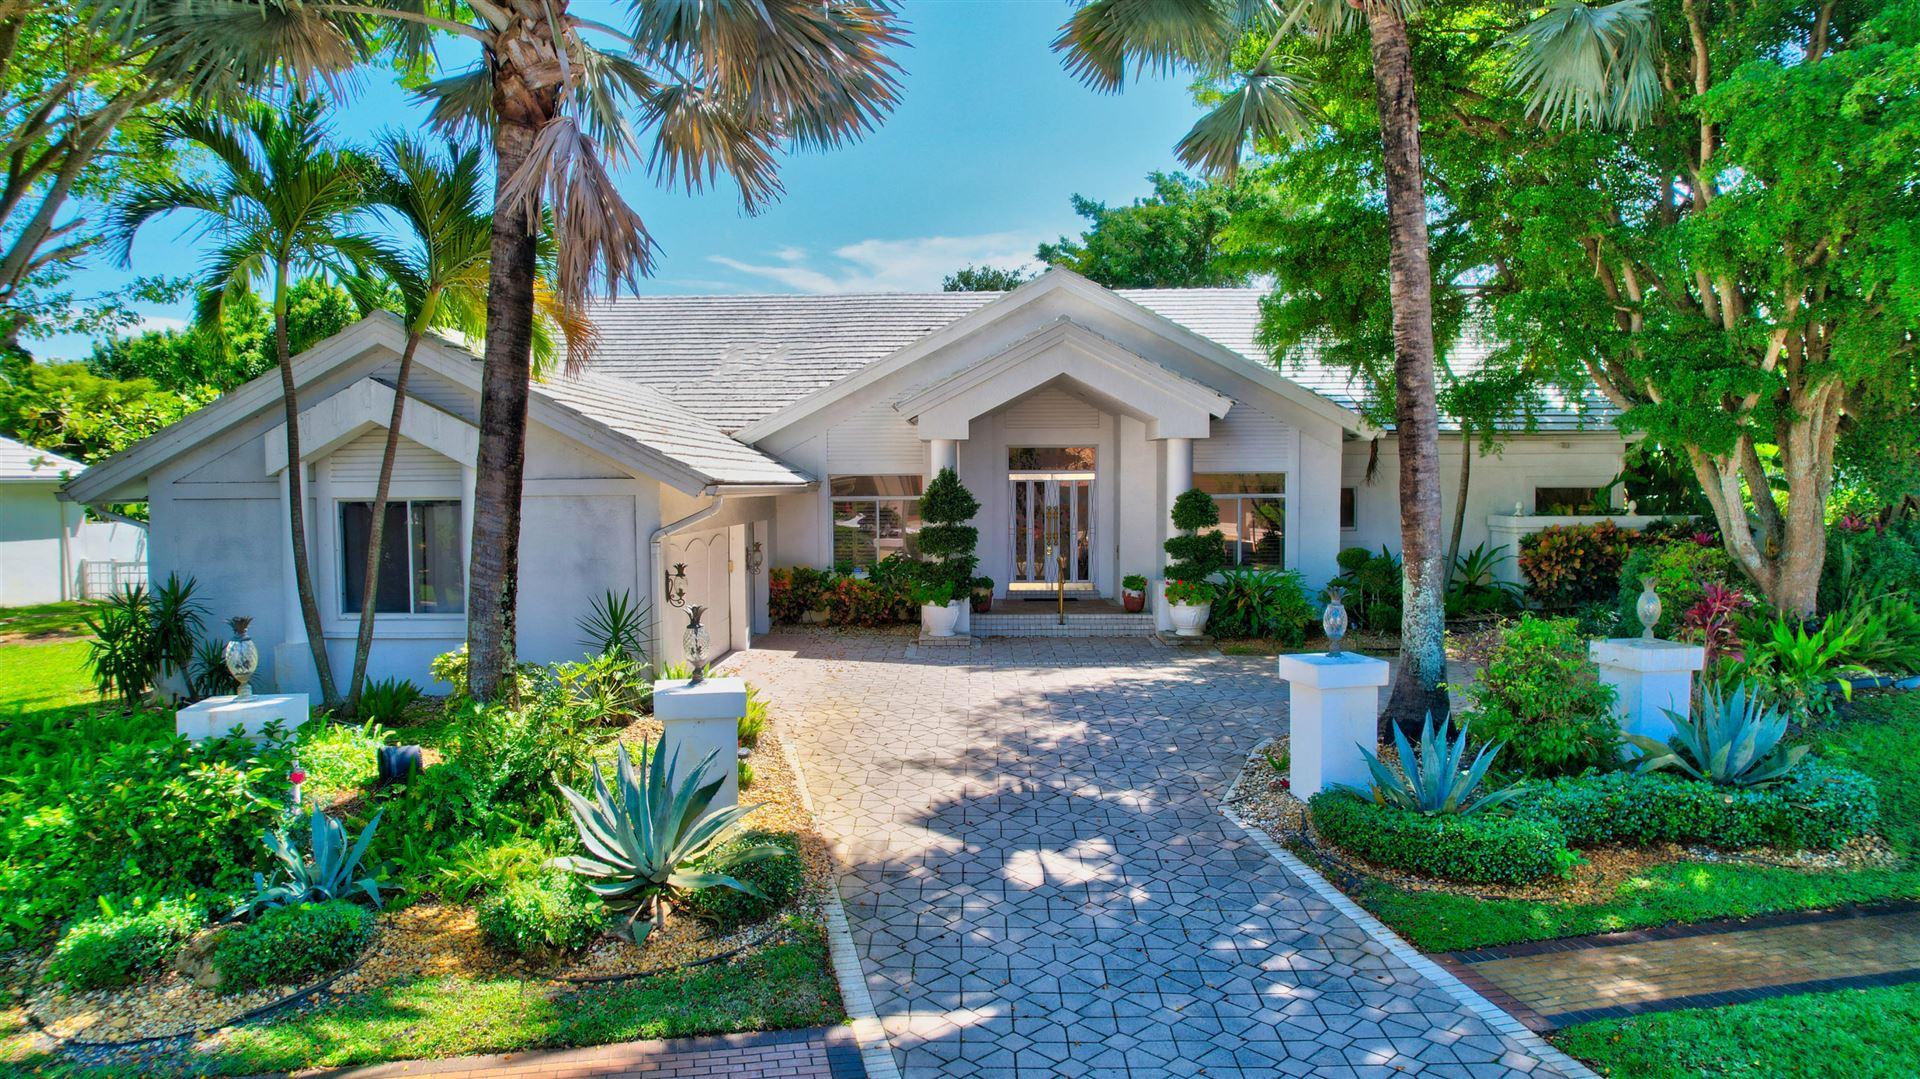 6924 Queenferry Circle, Boca Raton, FL 33496 - #: RX-10715392